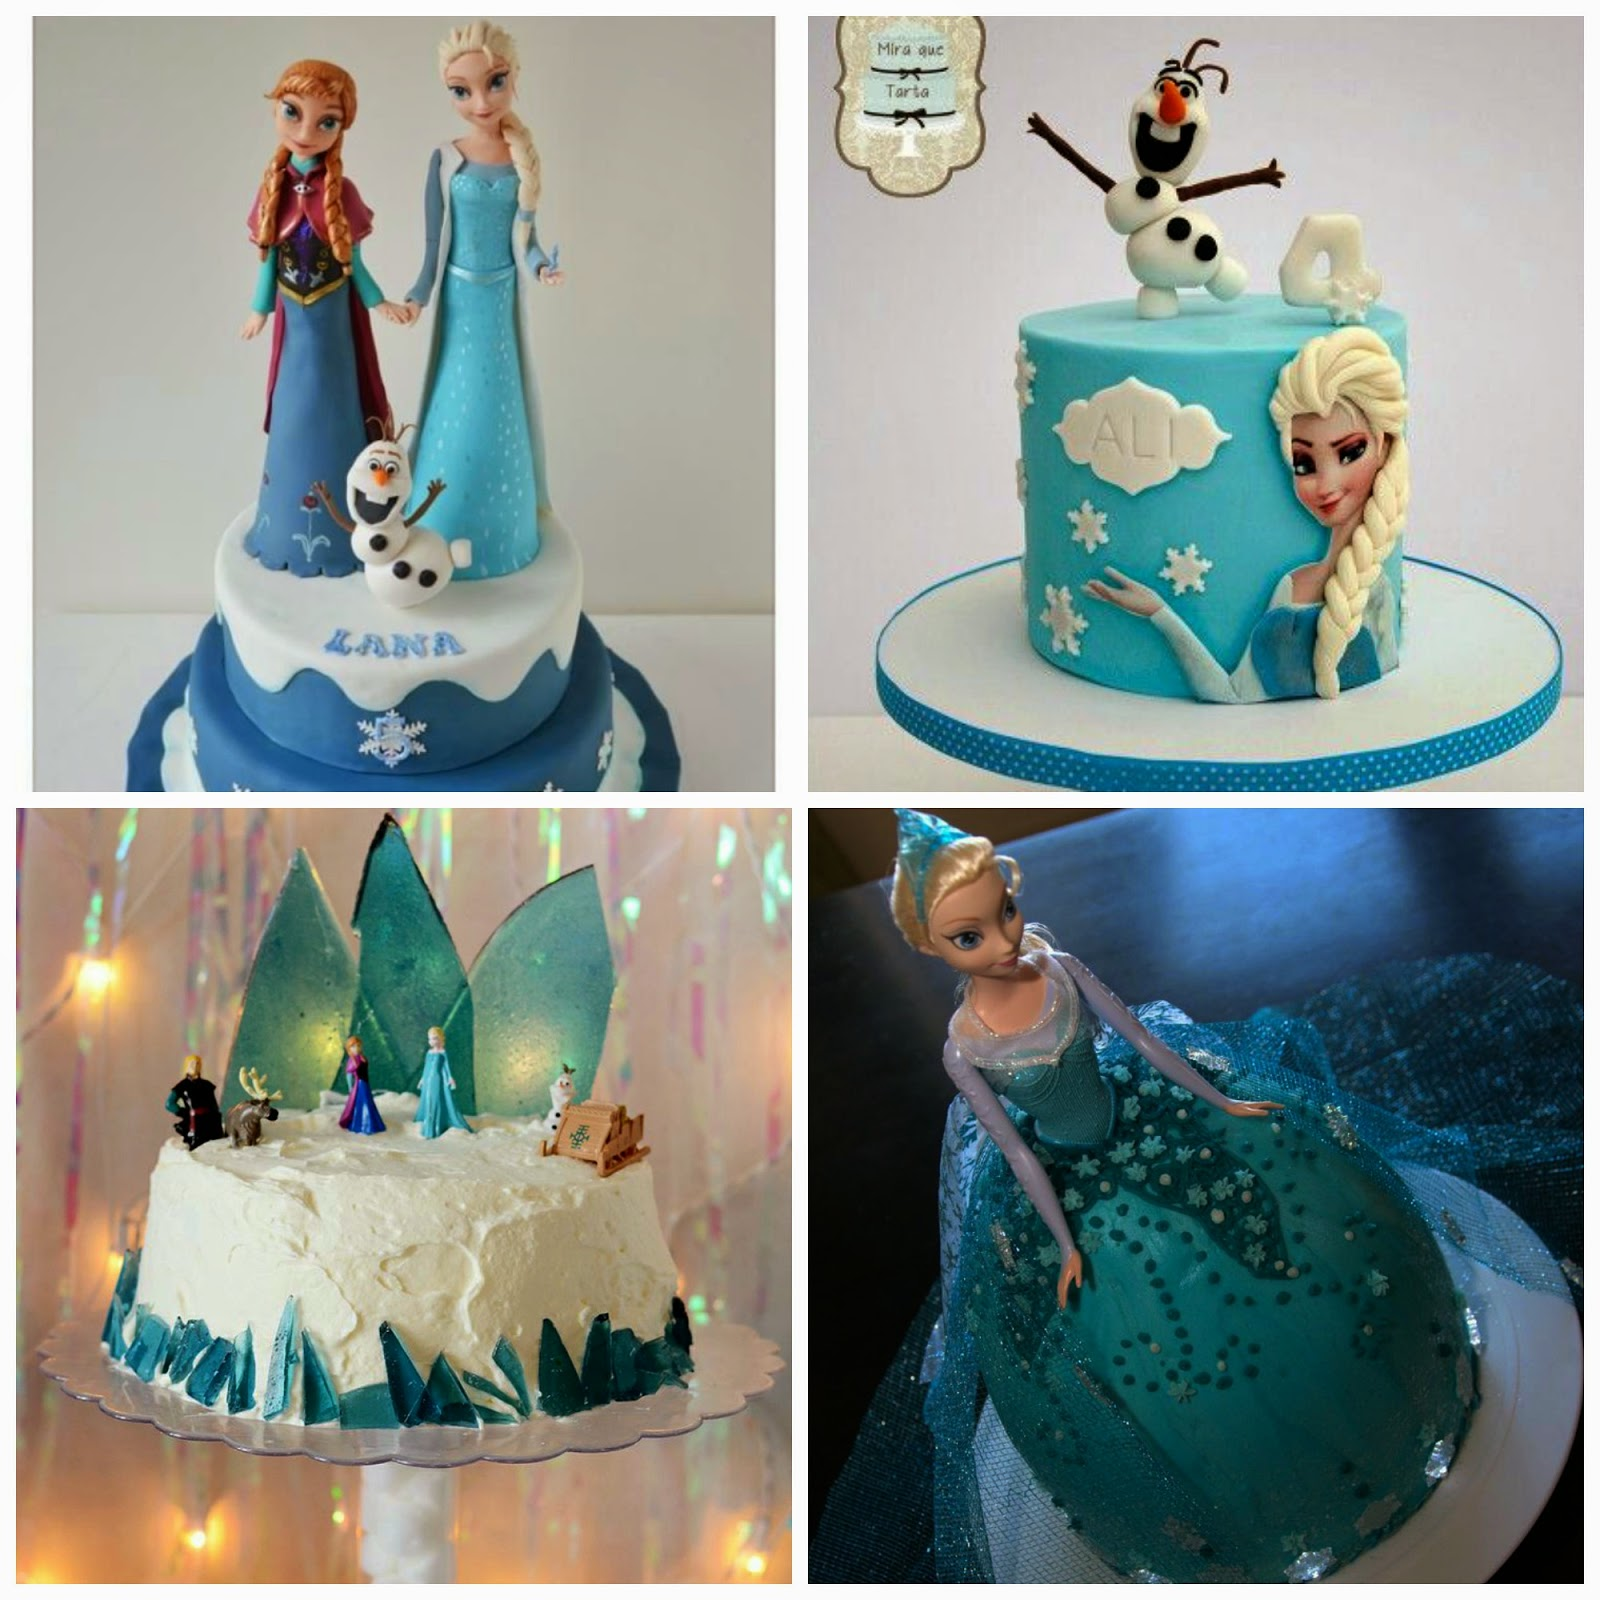 tarta de cumpleaños frozen disney blog niños mama de noa